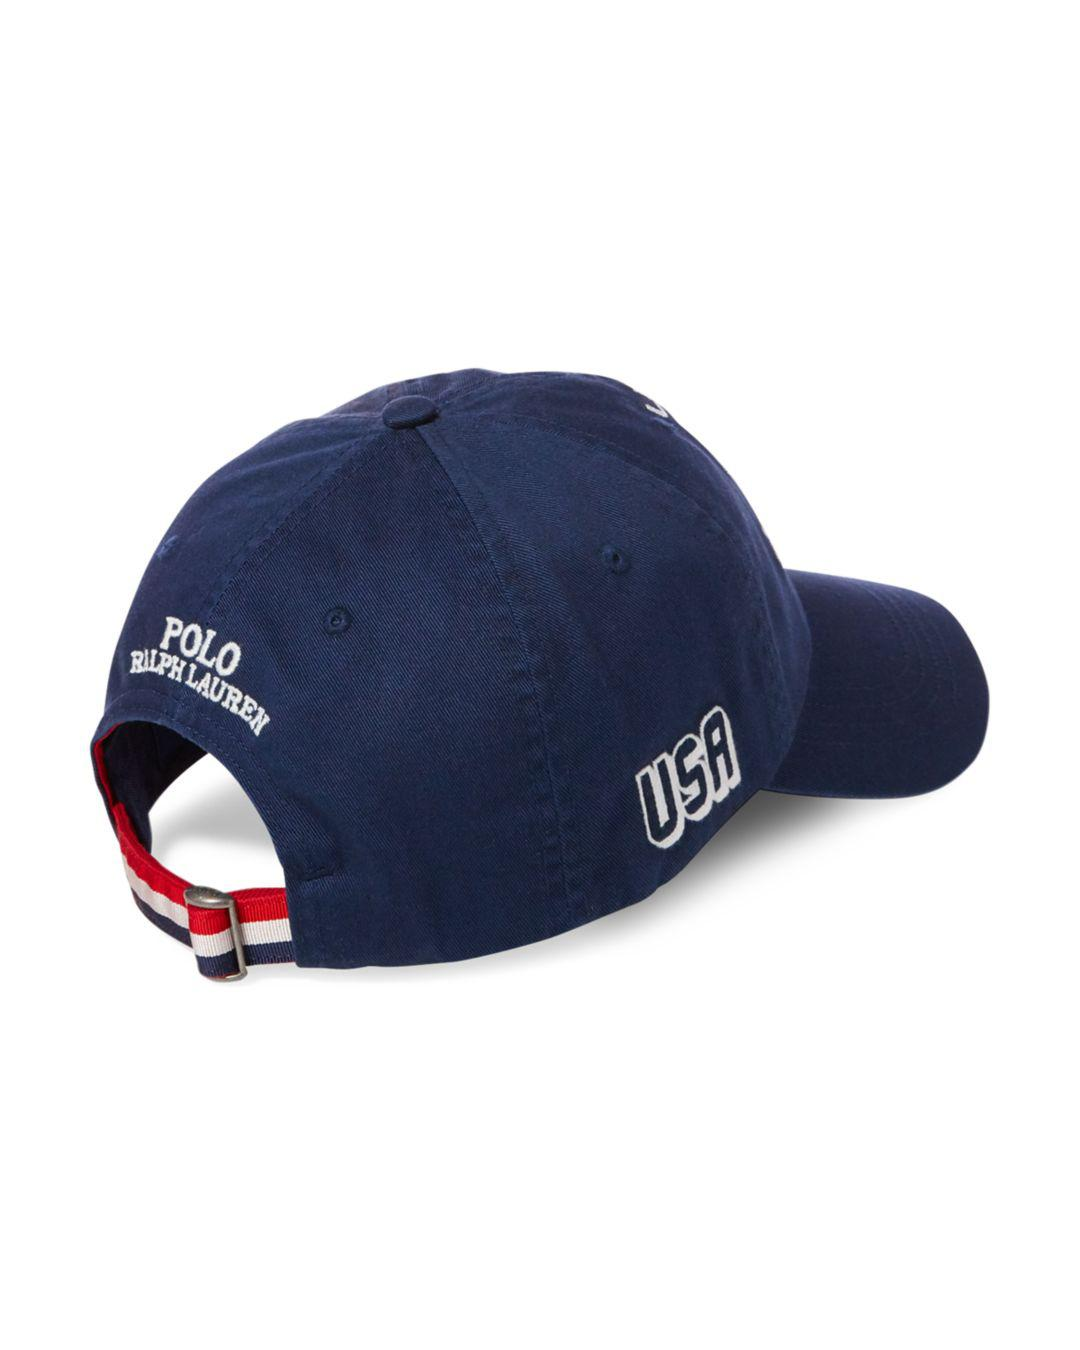 0da4573990b ... Lyst - Polo Ralph Lauren Usa Cotton Chino Cap in Blue for Men popular  stores 8968d ...